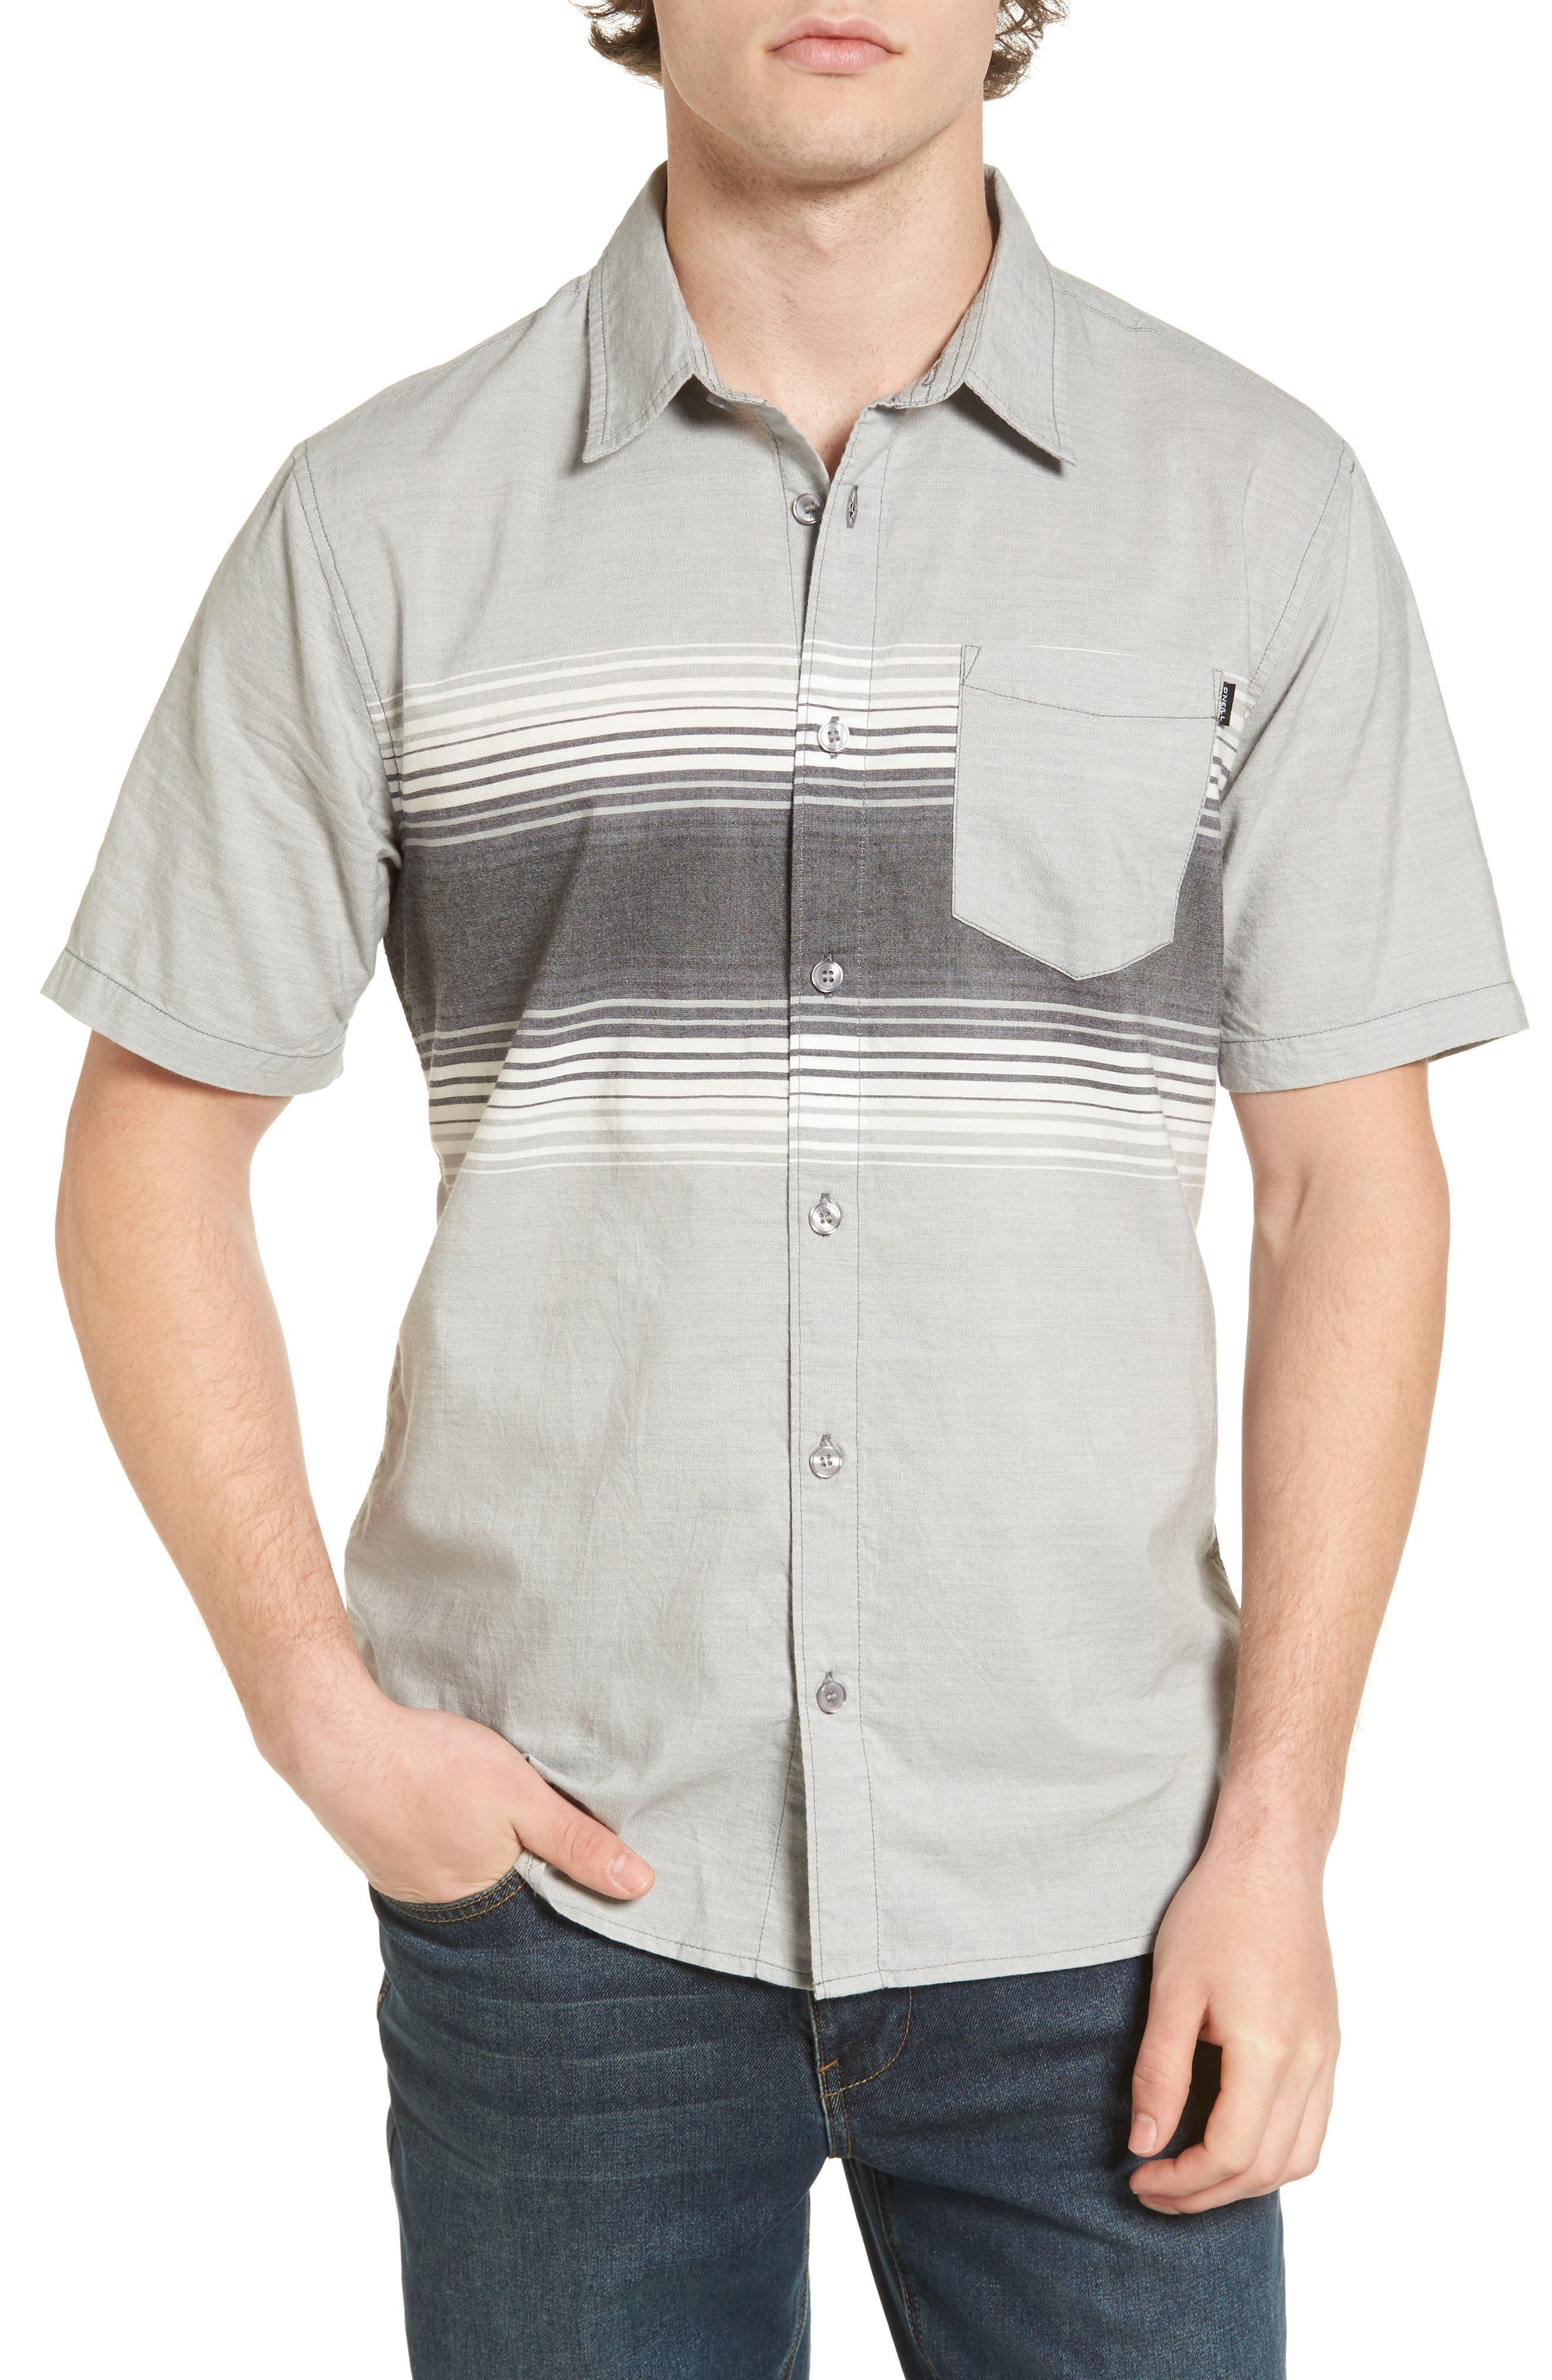 O'Neill Rodgers Woven Shirt